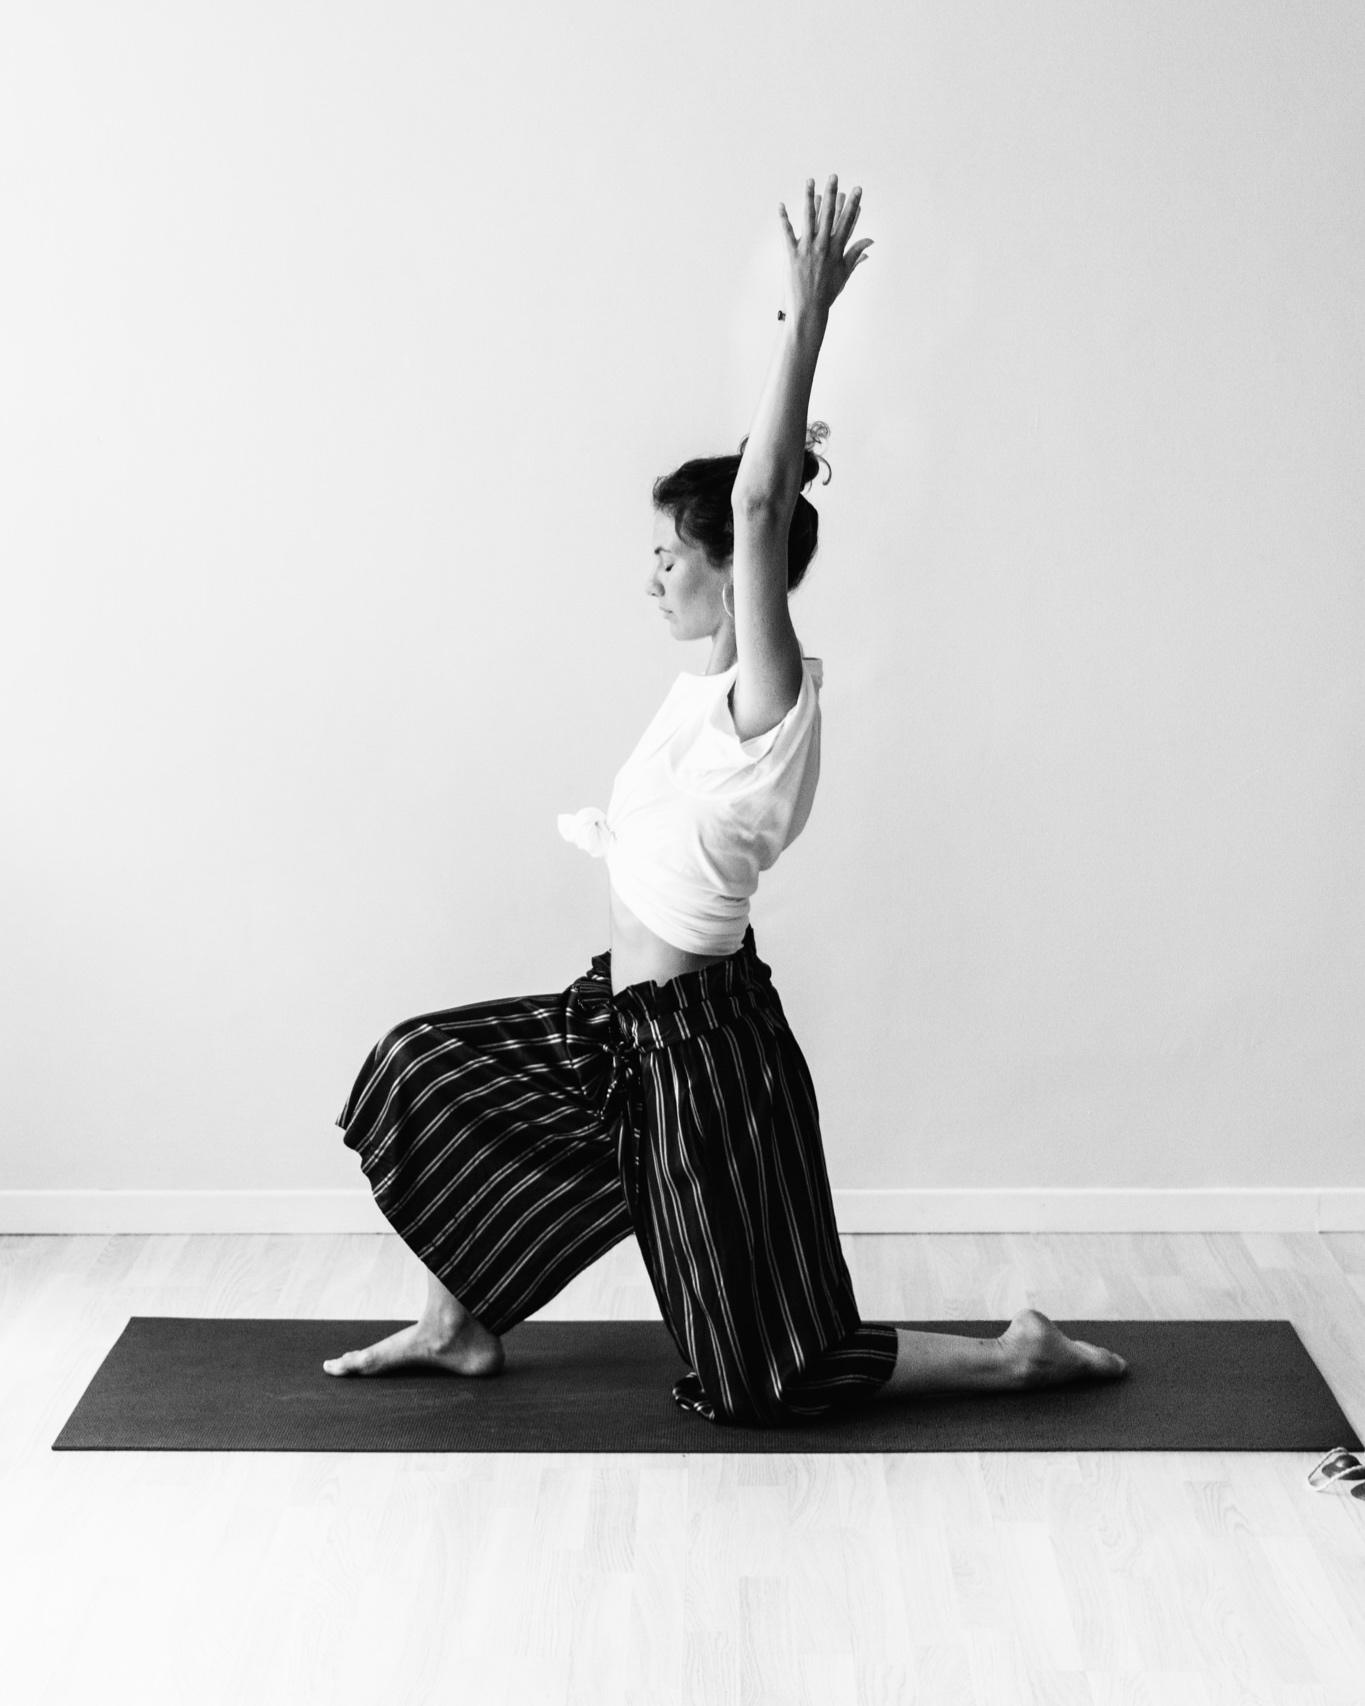 yoga_meditazione_torino_33-2.jpg